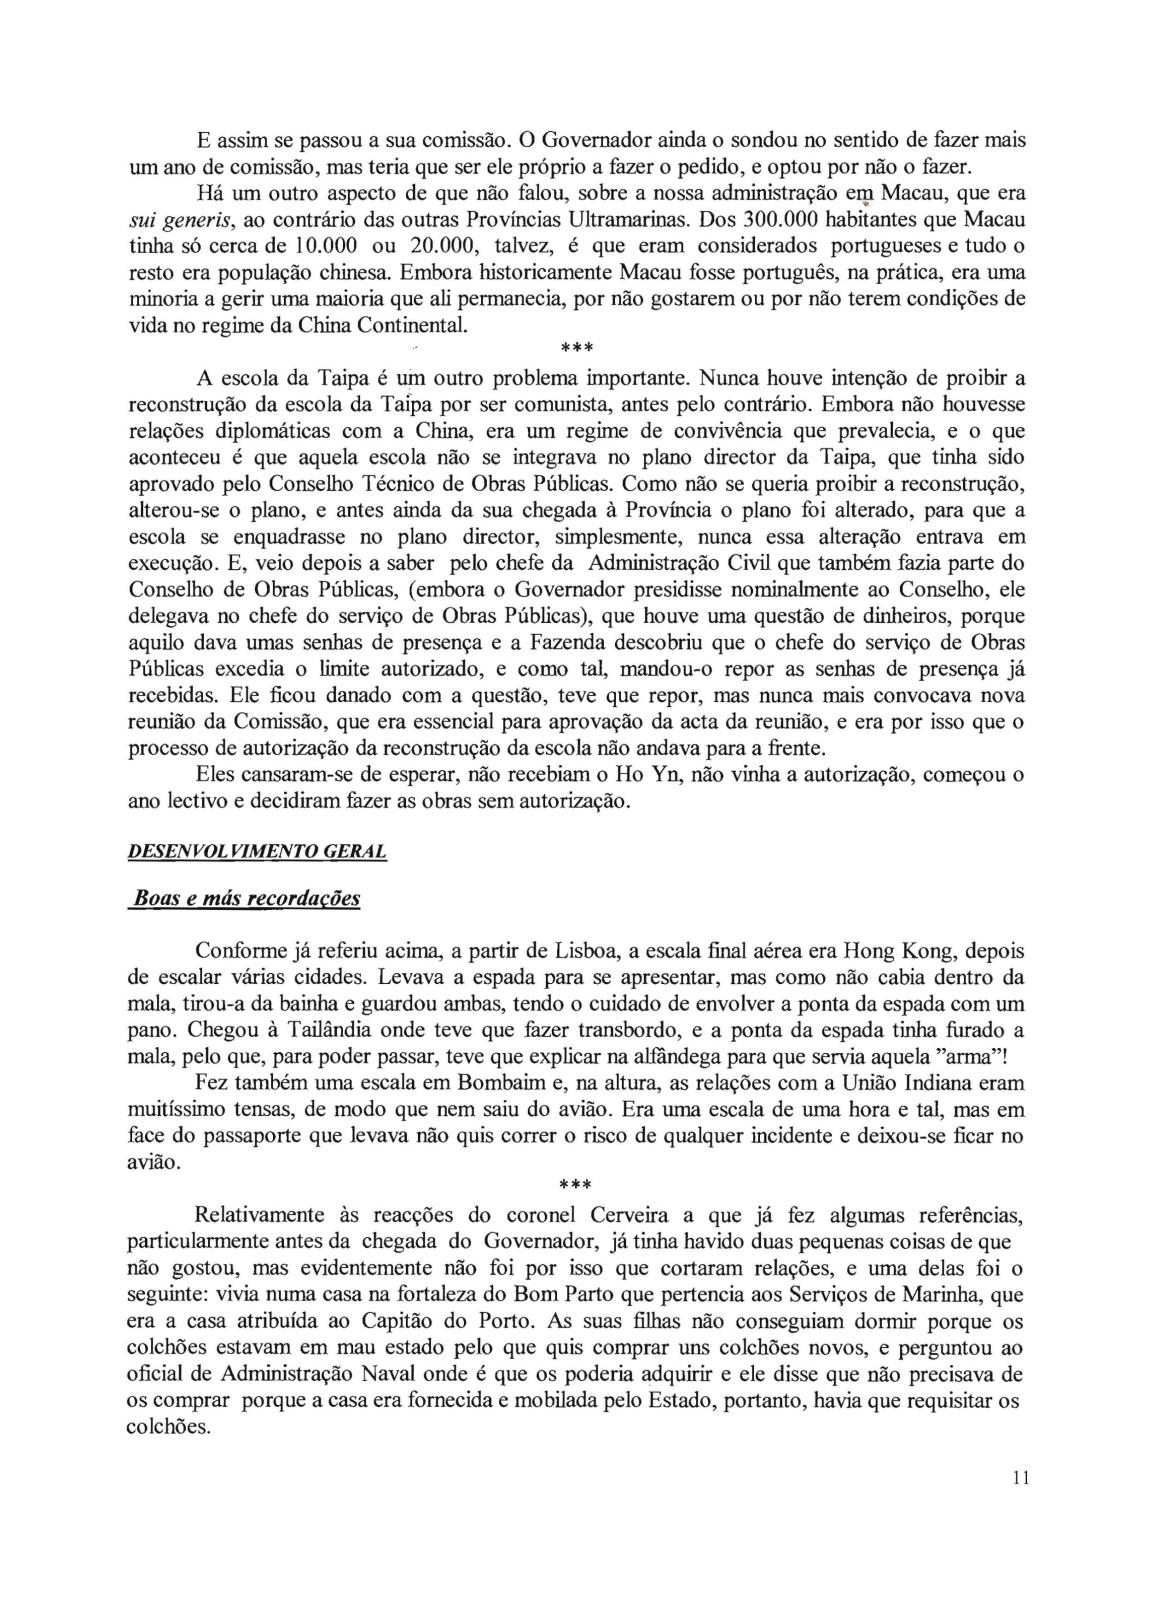 00476 01-03-28 Academia de Marinha-Entrevista do Alm Nunes da Silva pg 11 de 12